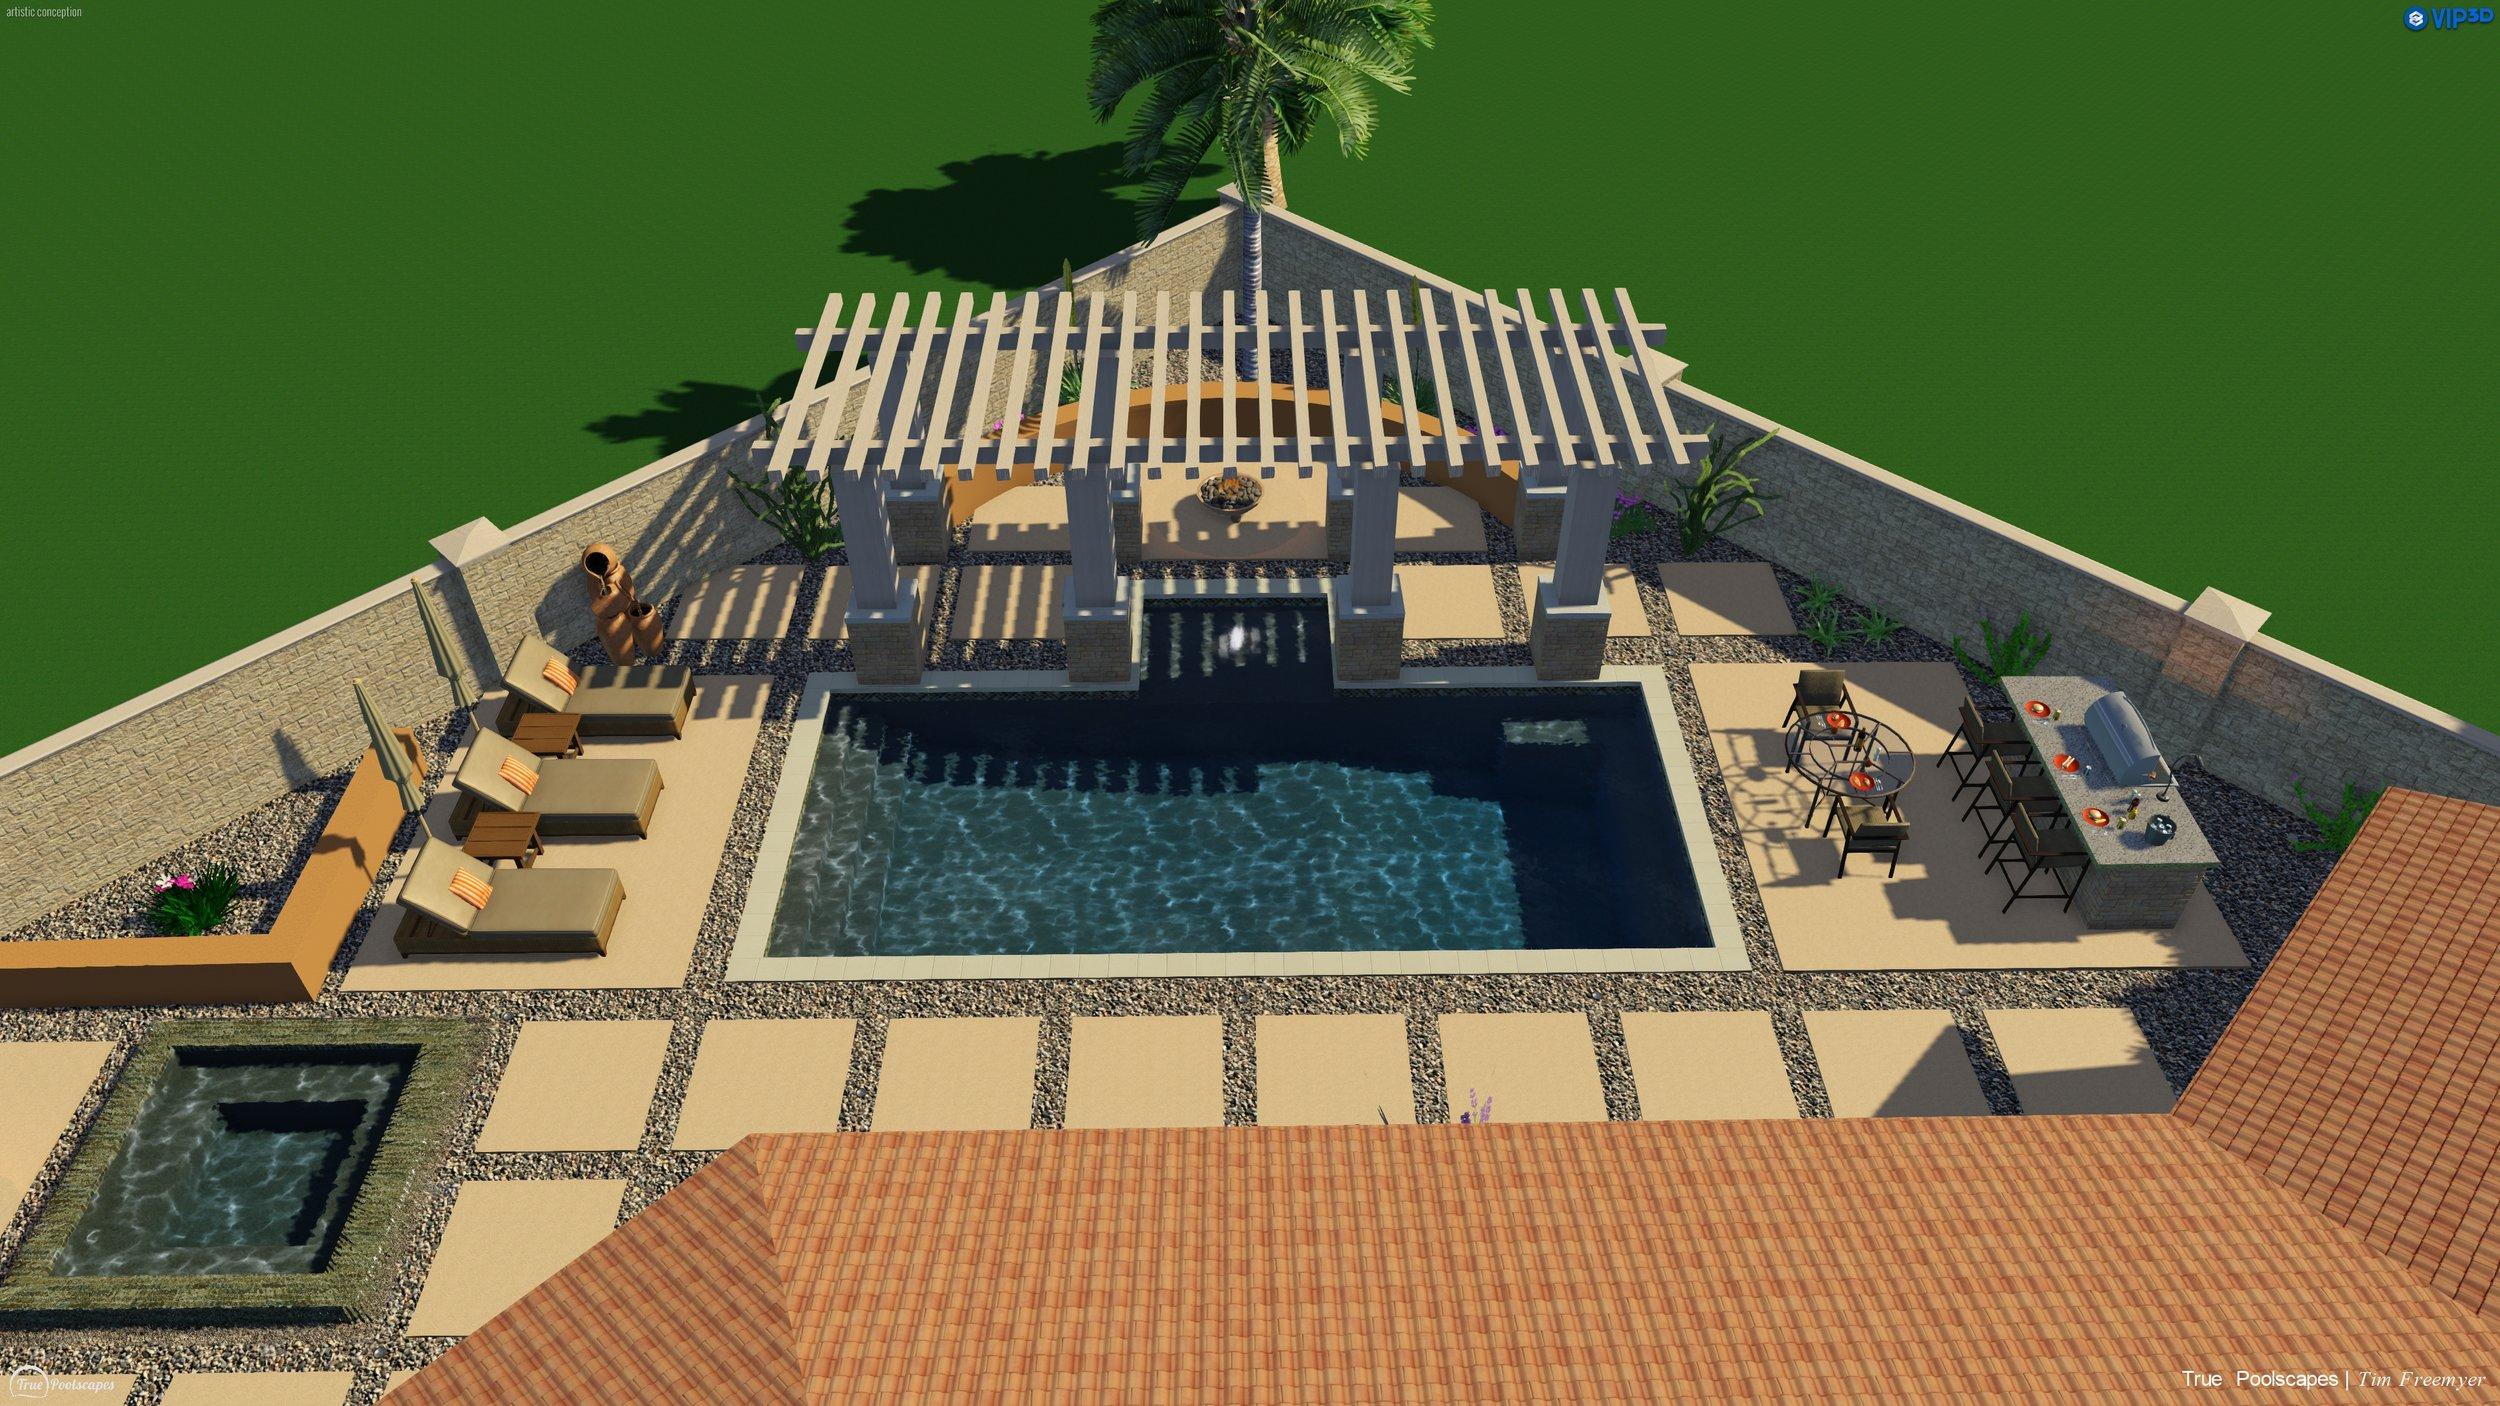 Sample geometric pool